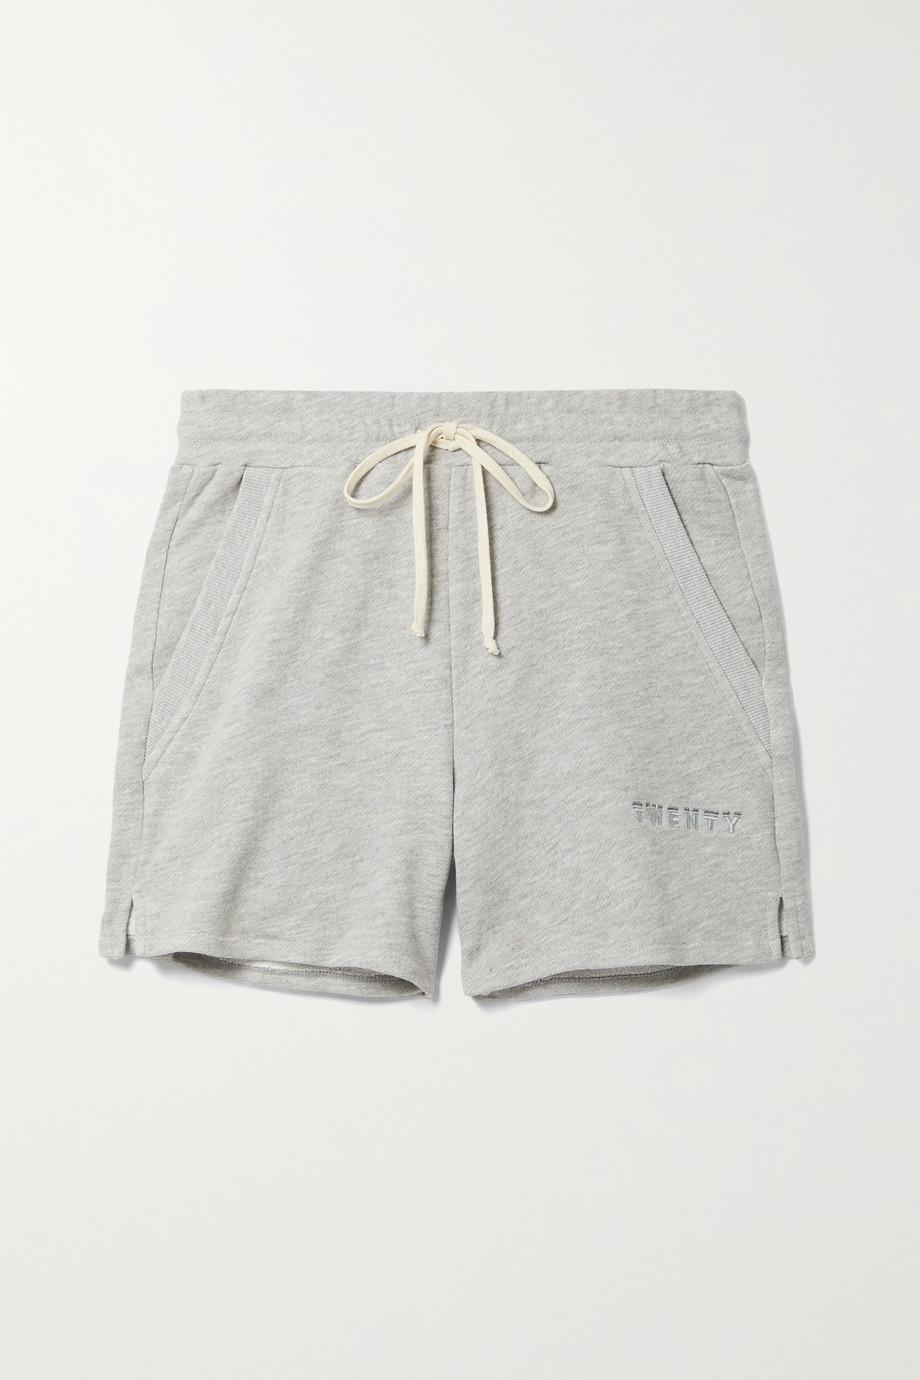 TWENTY Montréal Sunnyside cotton-blend jersey shorts